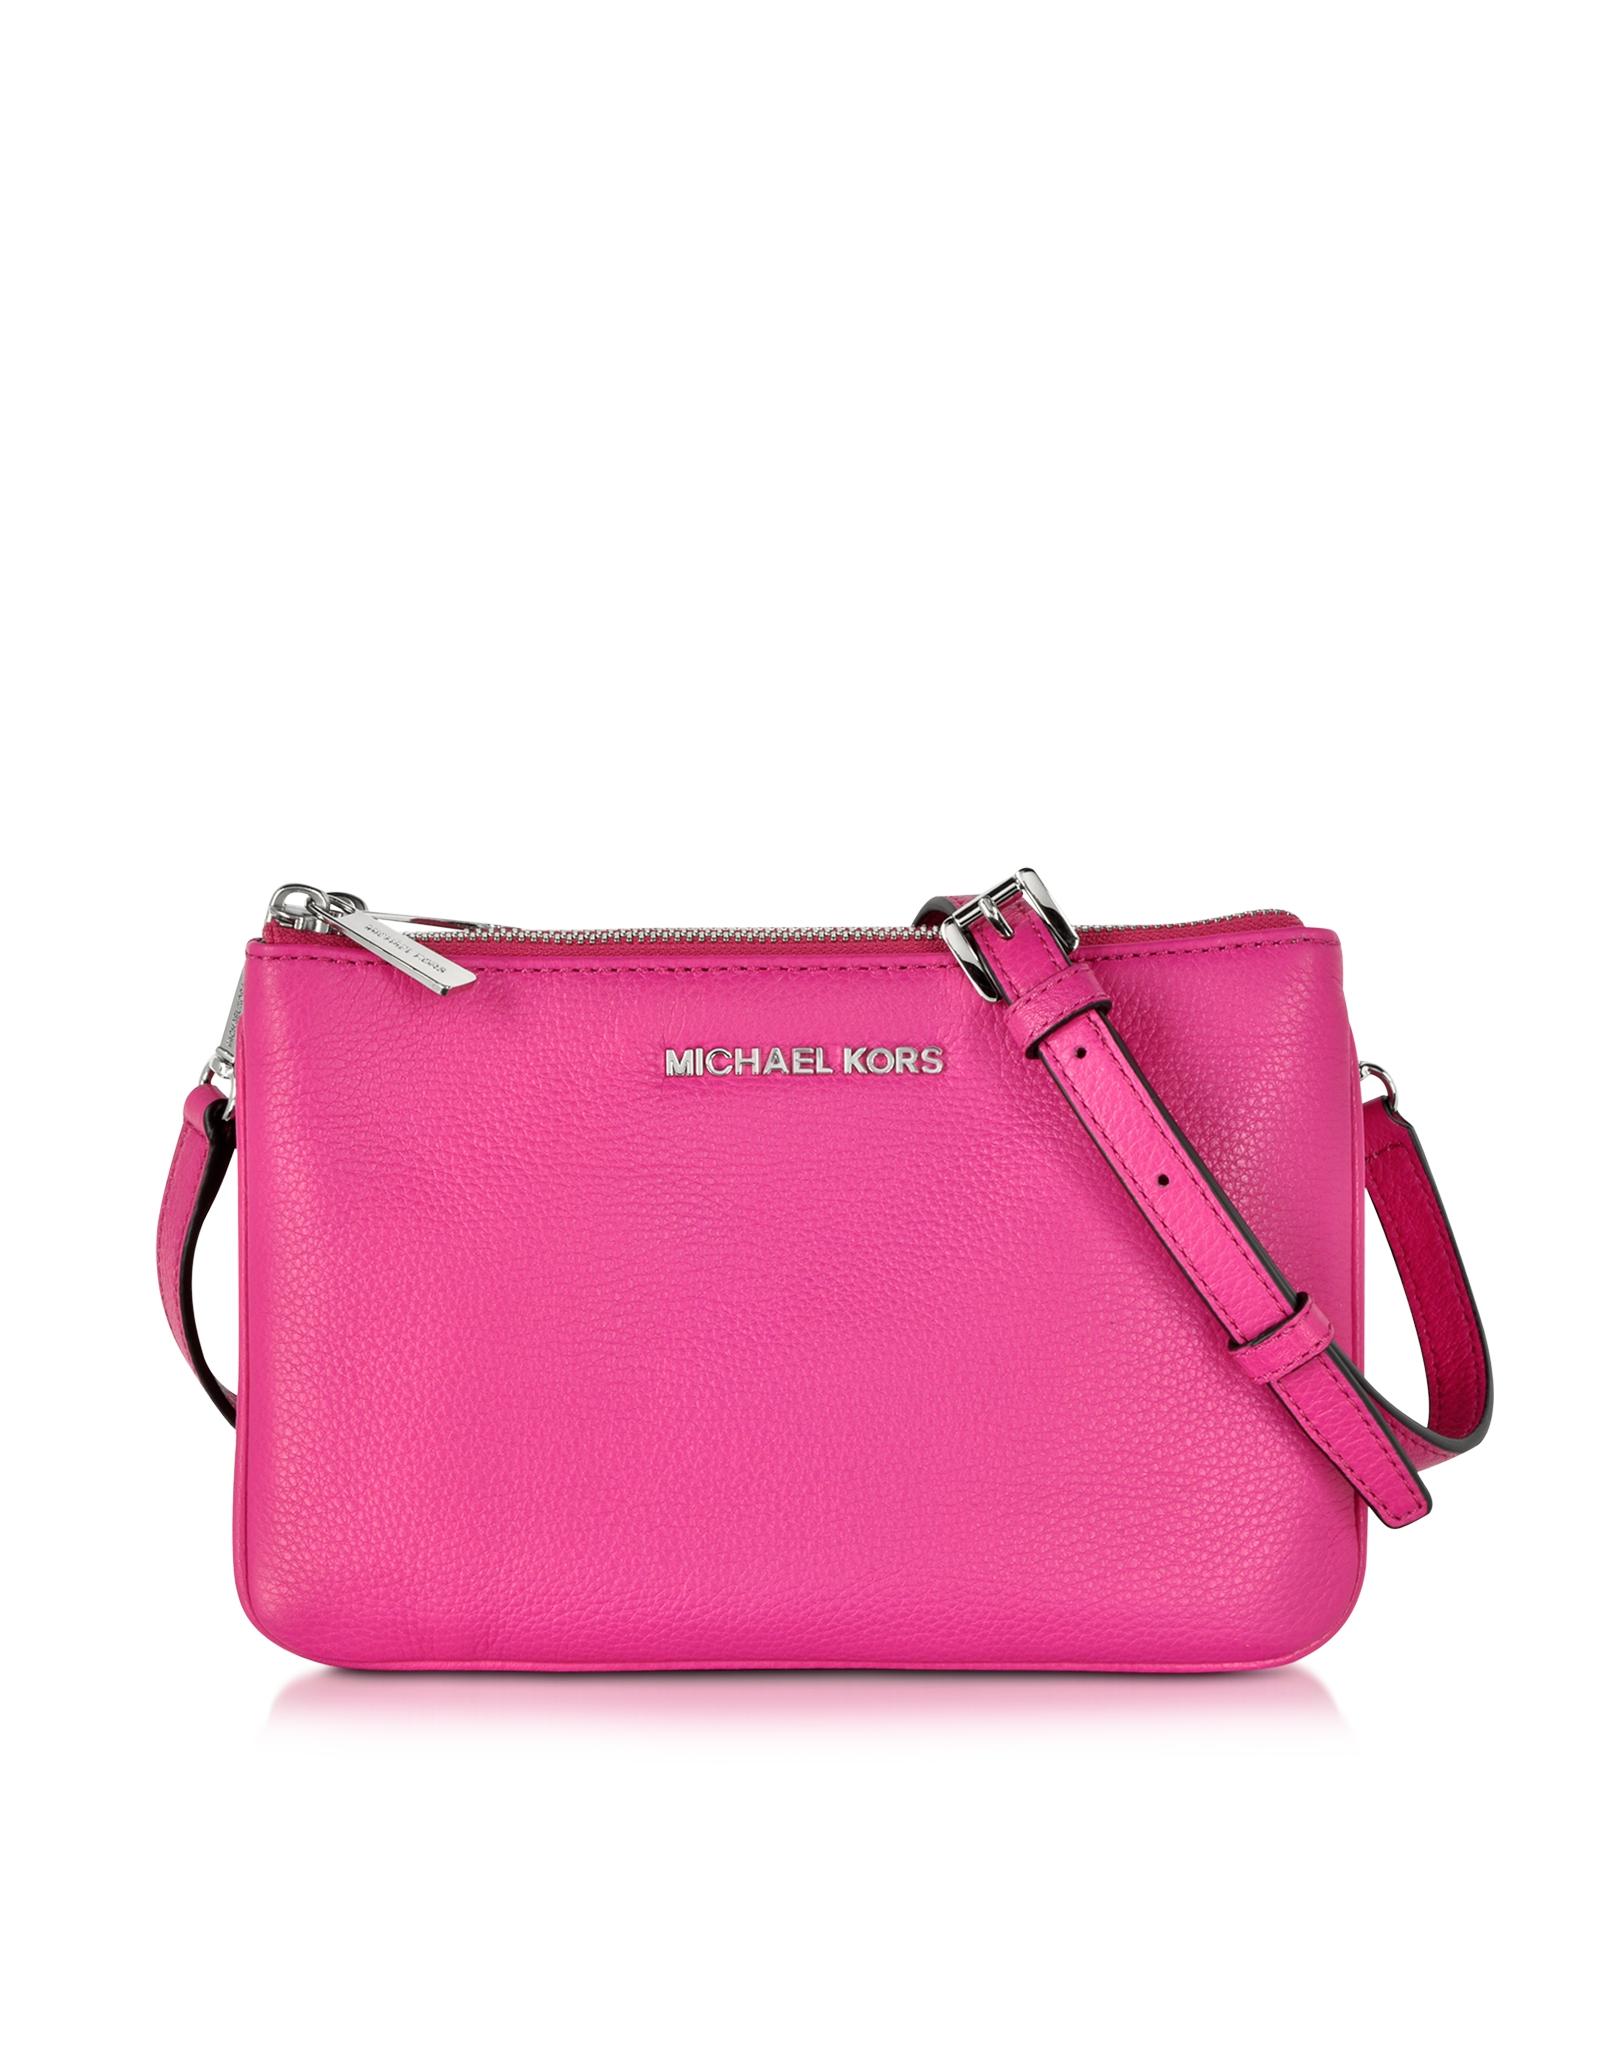 527fdcb581d3 Lyst - Michael Kors Bedford Raspberry Leather Gusset Crossbody Bag ...